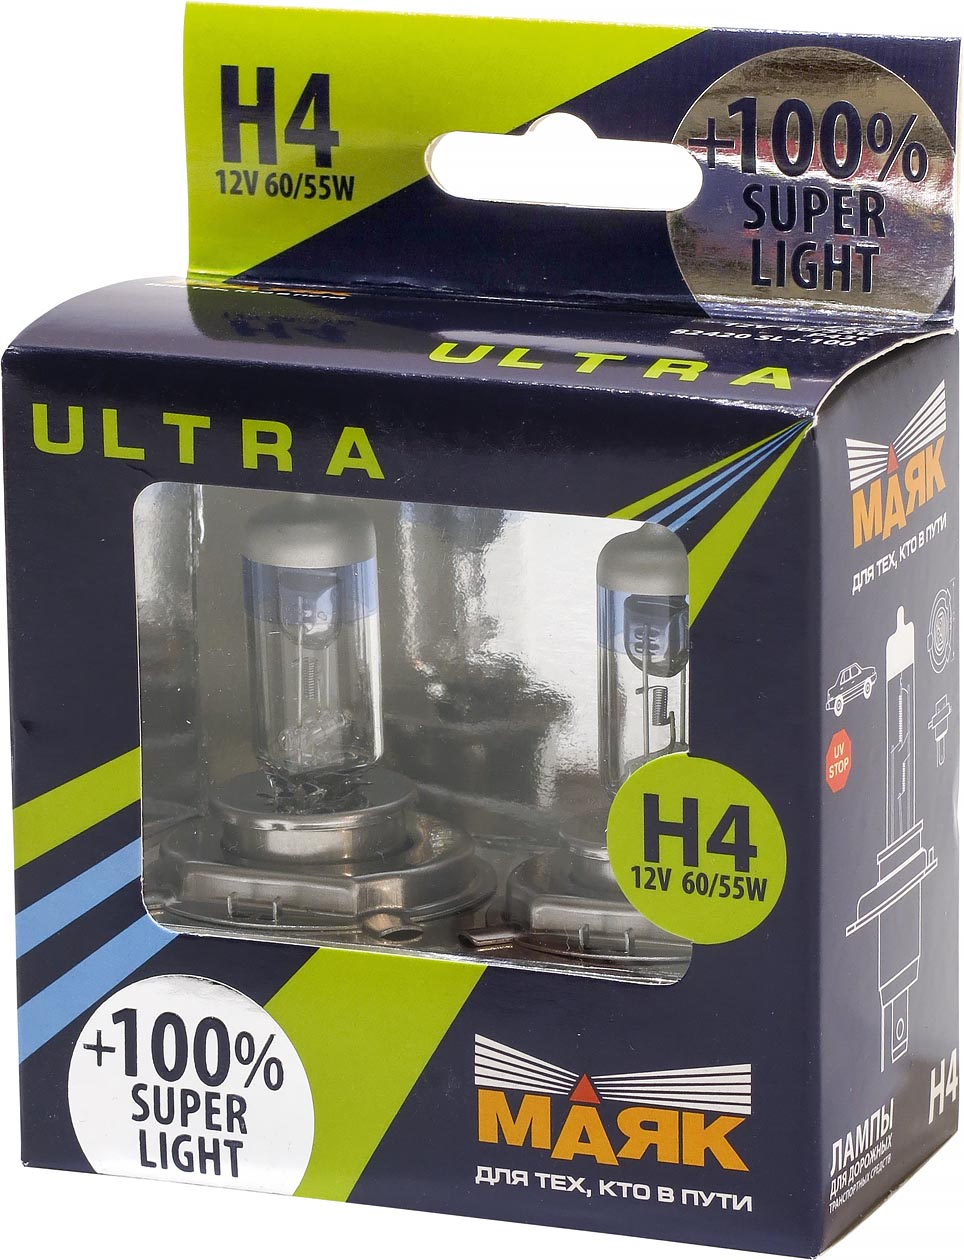 test-H4_lamps_6.jpg